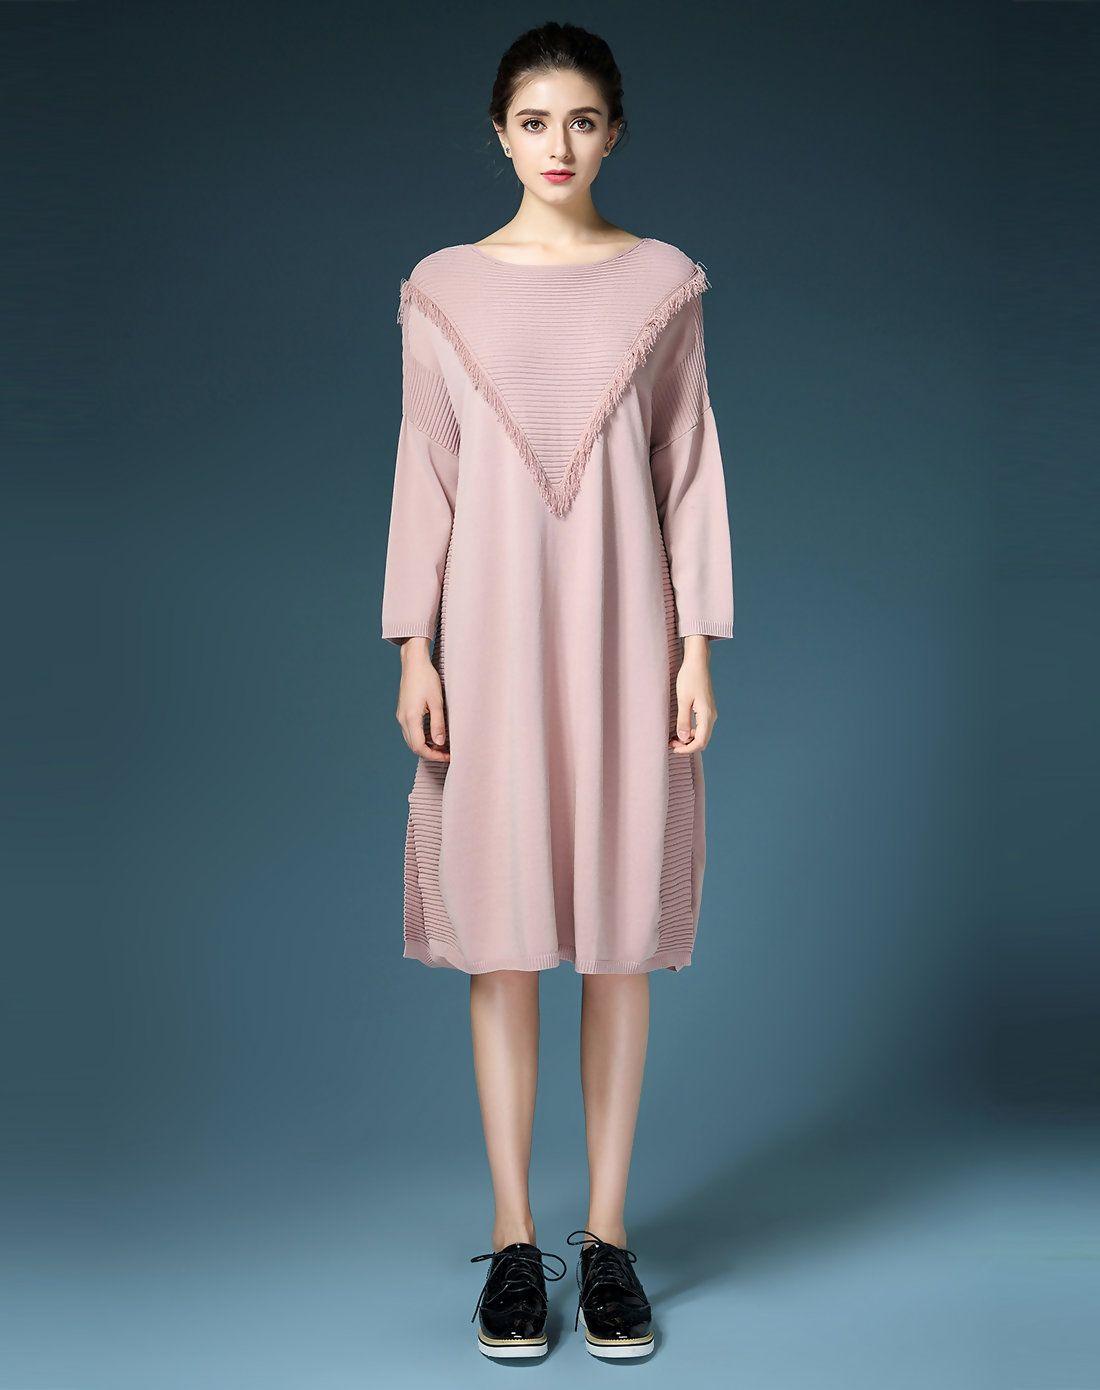 Adorewe vipme aline dresses phoebe fp lilac round neck fringe